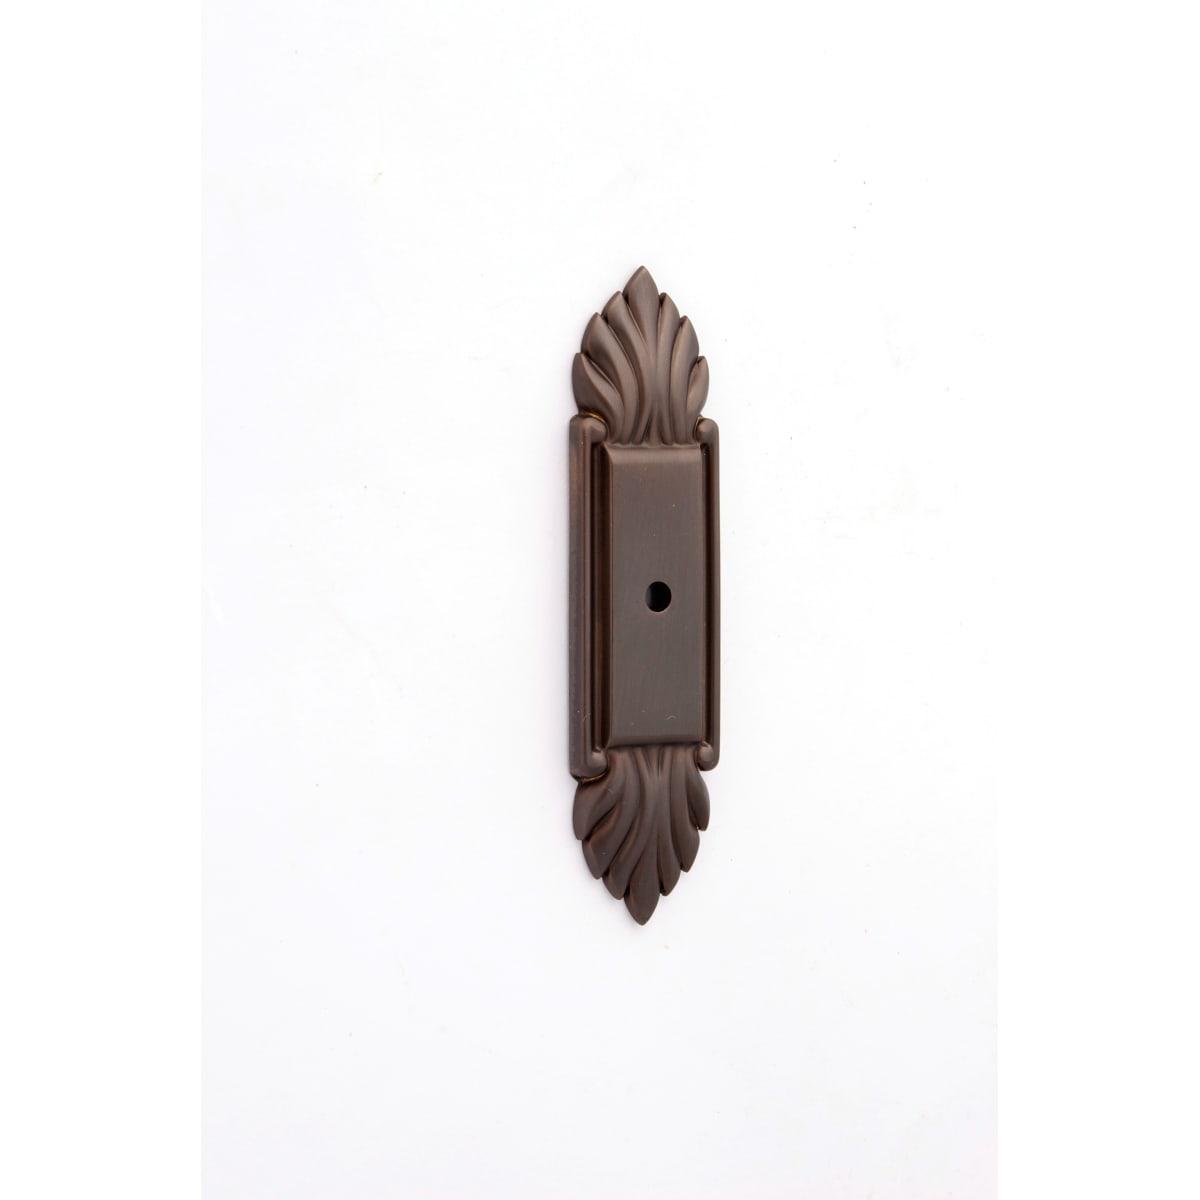 Alno Fiore 4 Inch Long Cabinet Knob Backplate